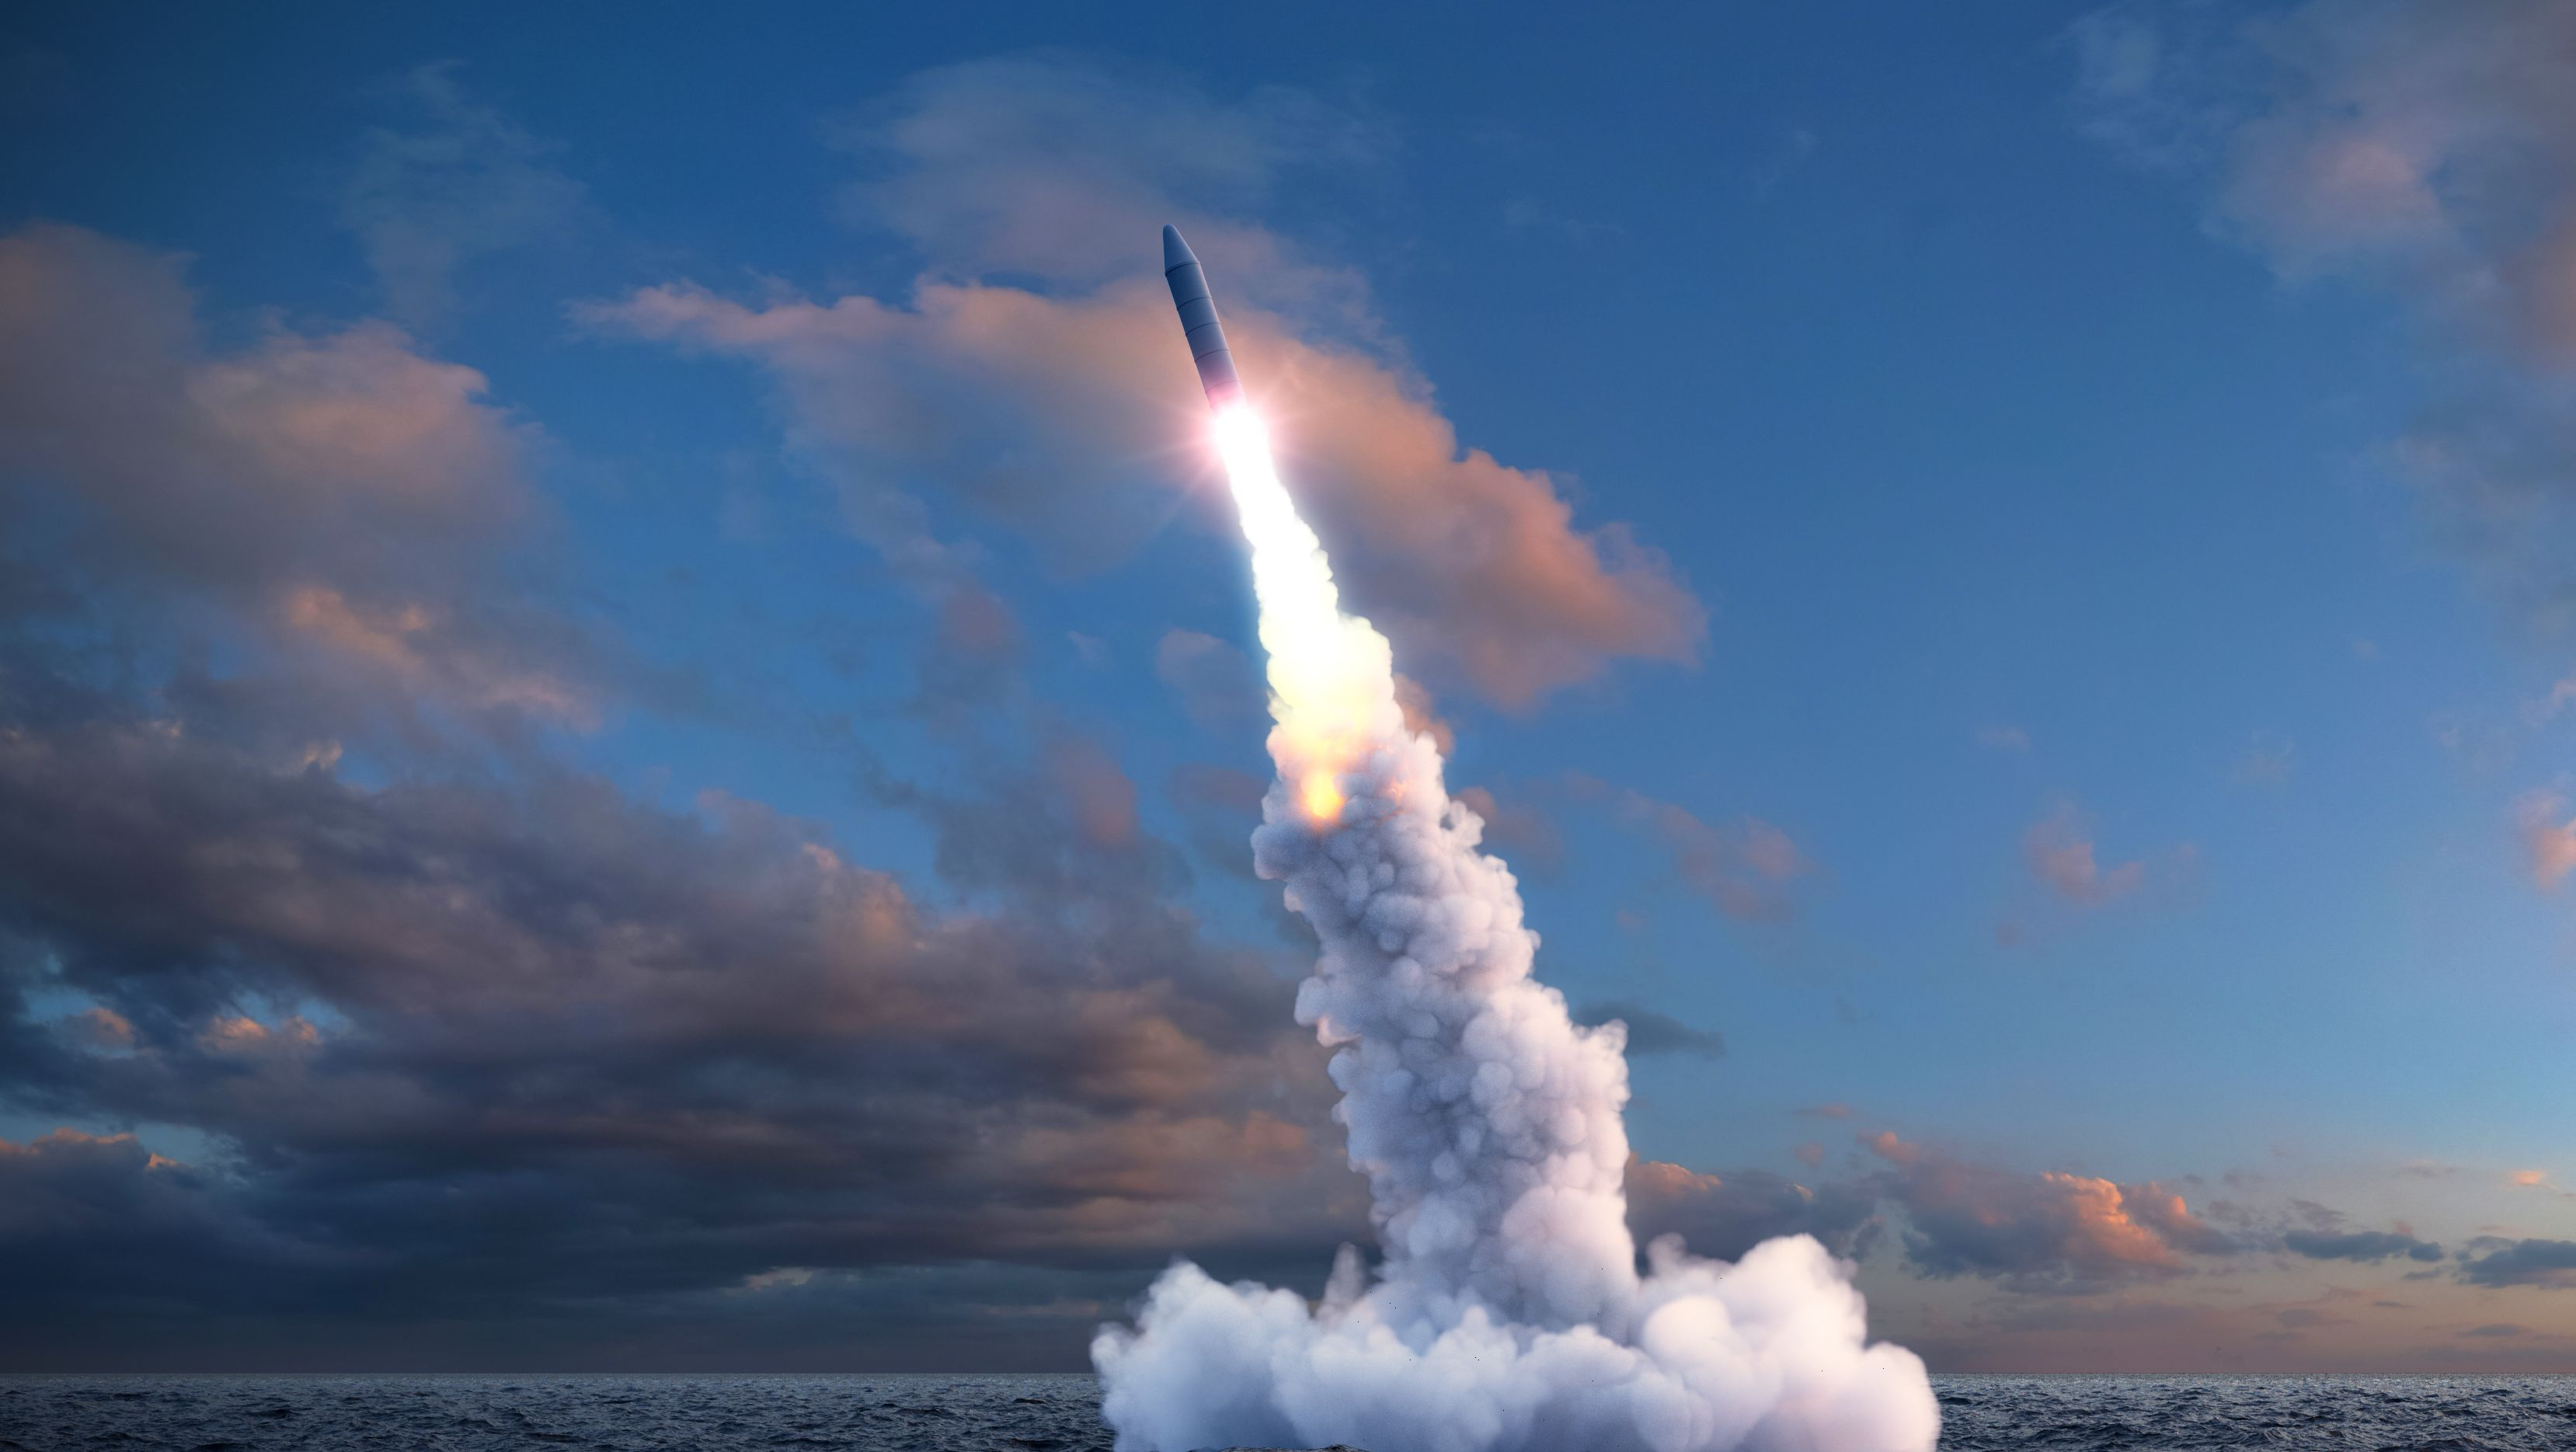 Atomrakete über dem Meer